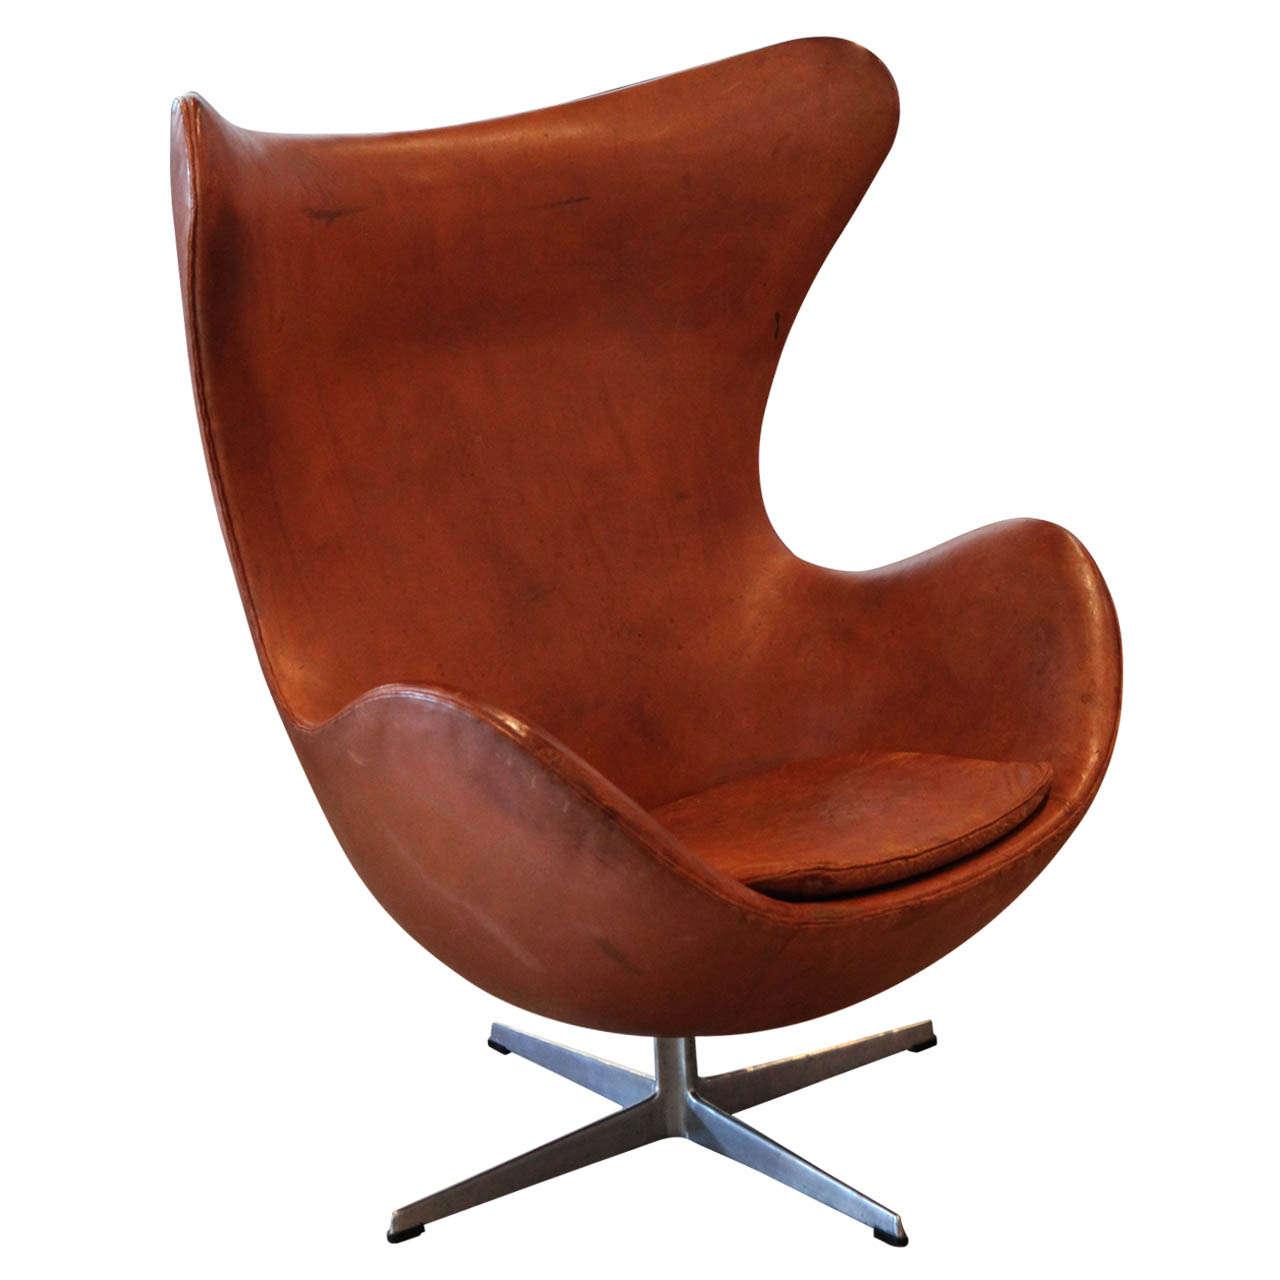 arne jacobsen cognac egg chair denmark 1969 at 1stdibs. Black Bedroom Furniture Sets. Home Design Ideas